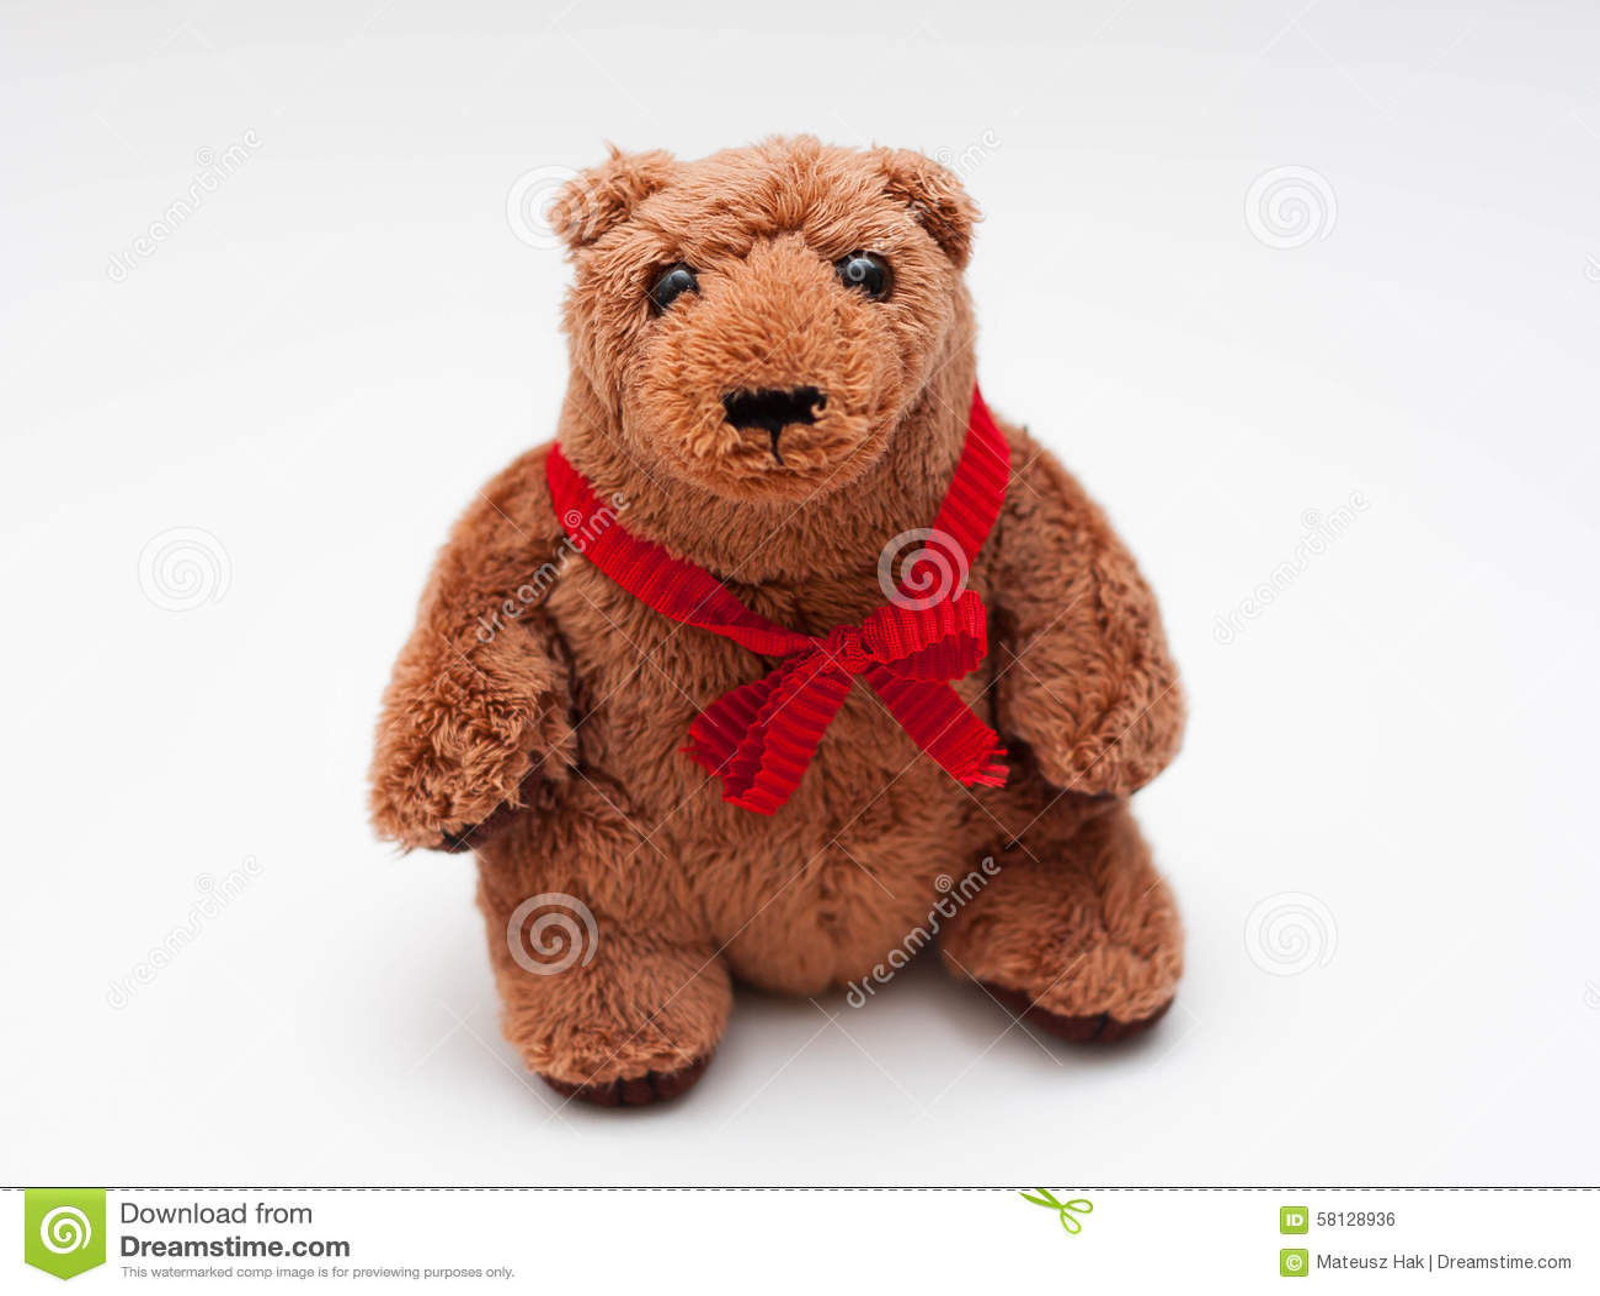 Teddy Bear Stock Photo - Image: 58128936